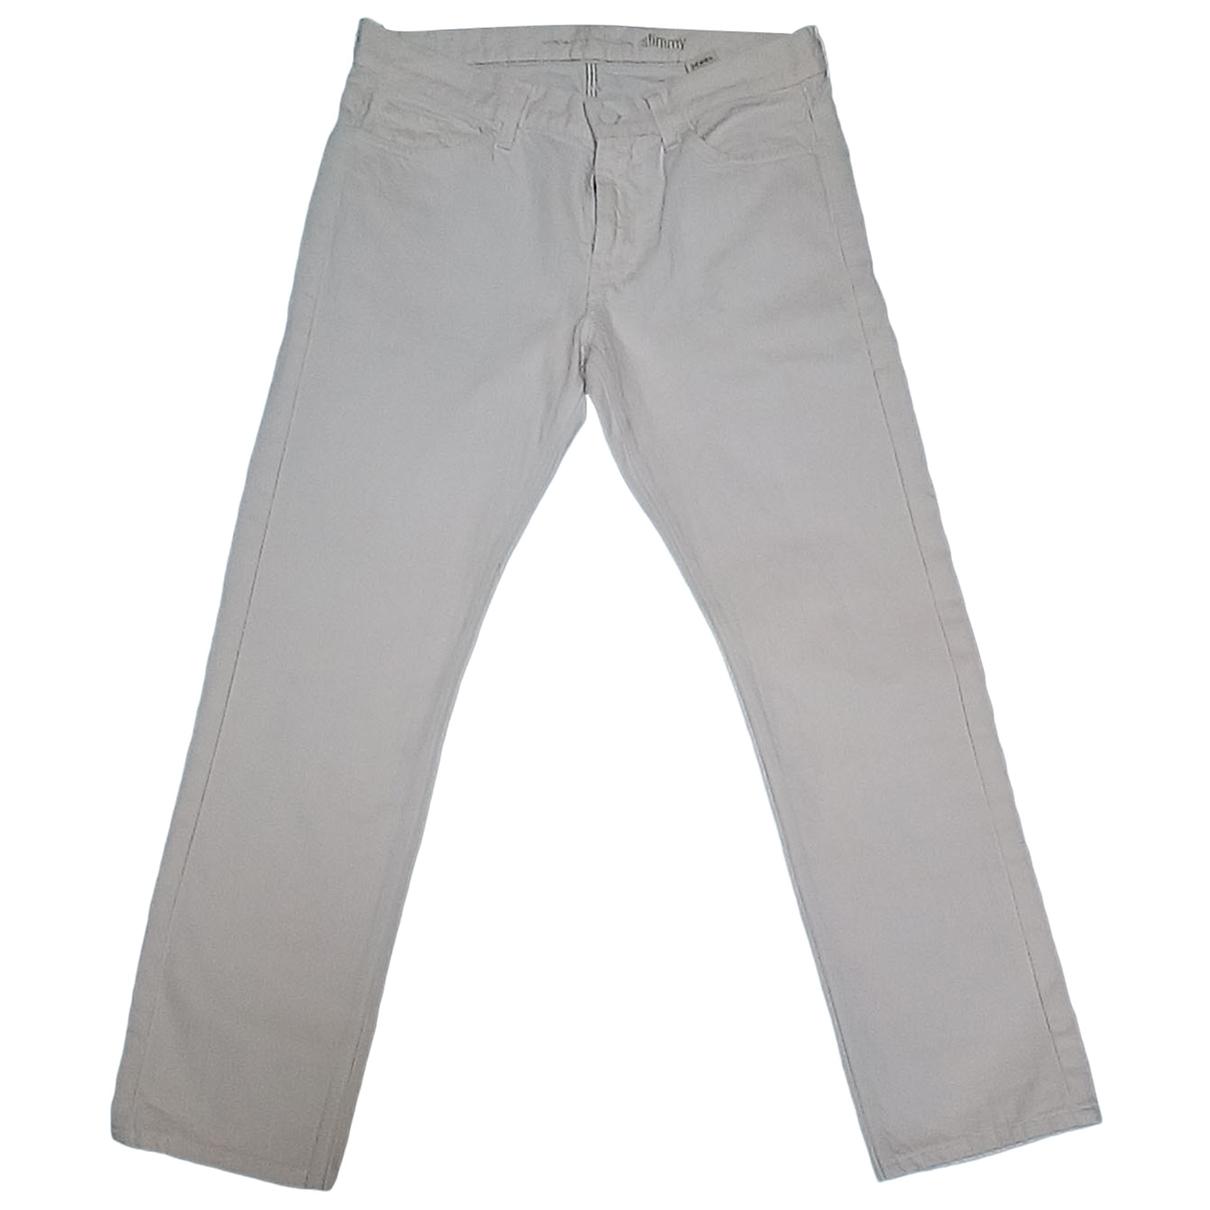 Pantalones en Algodon Blanco 7 For All Mankind